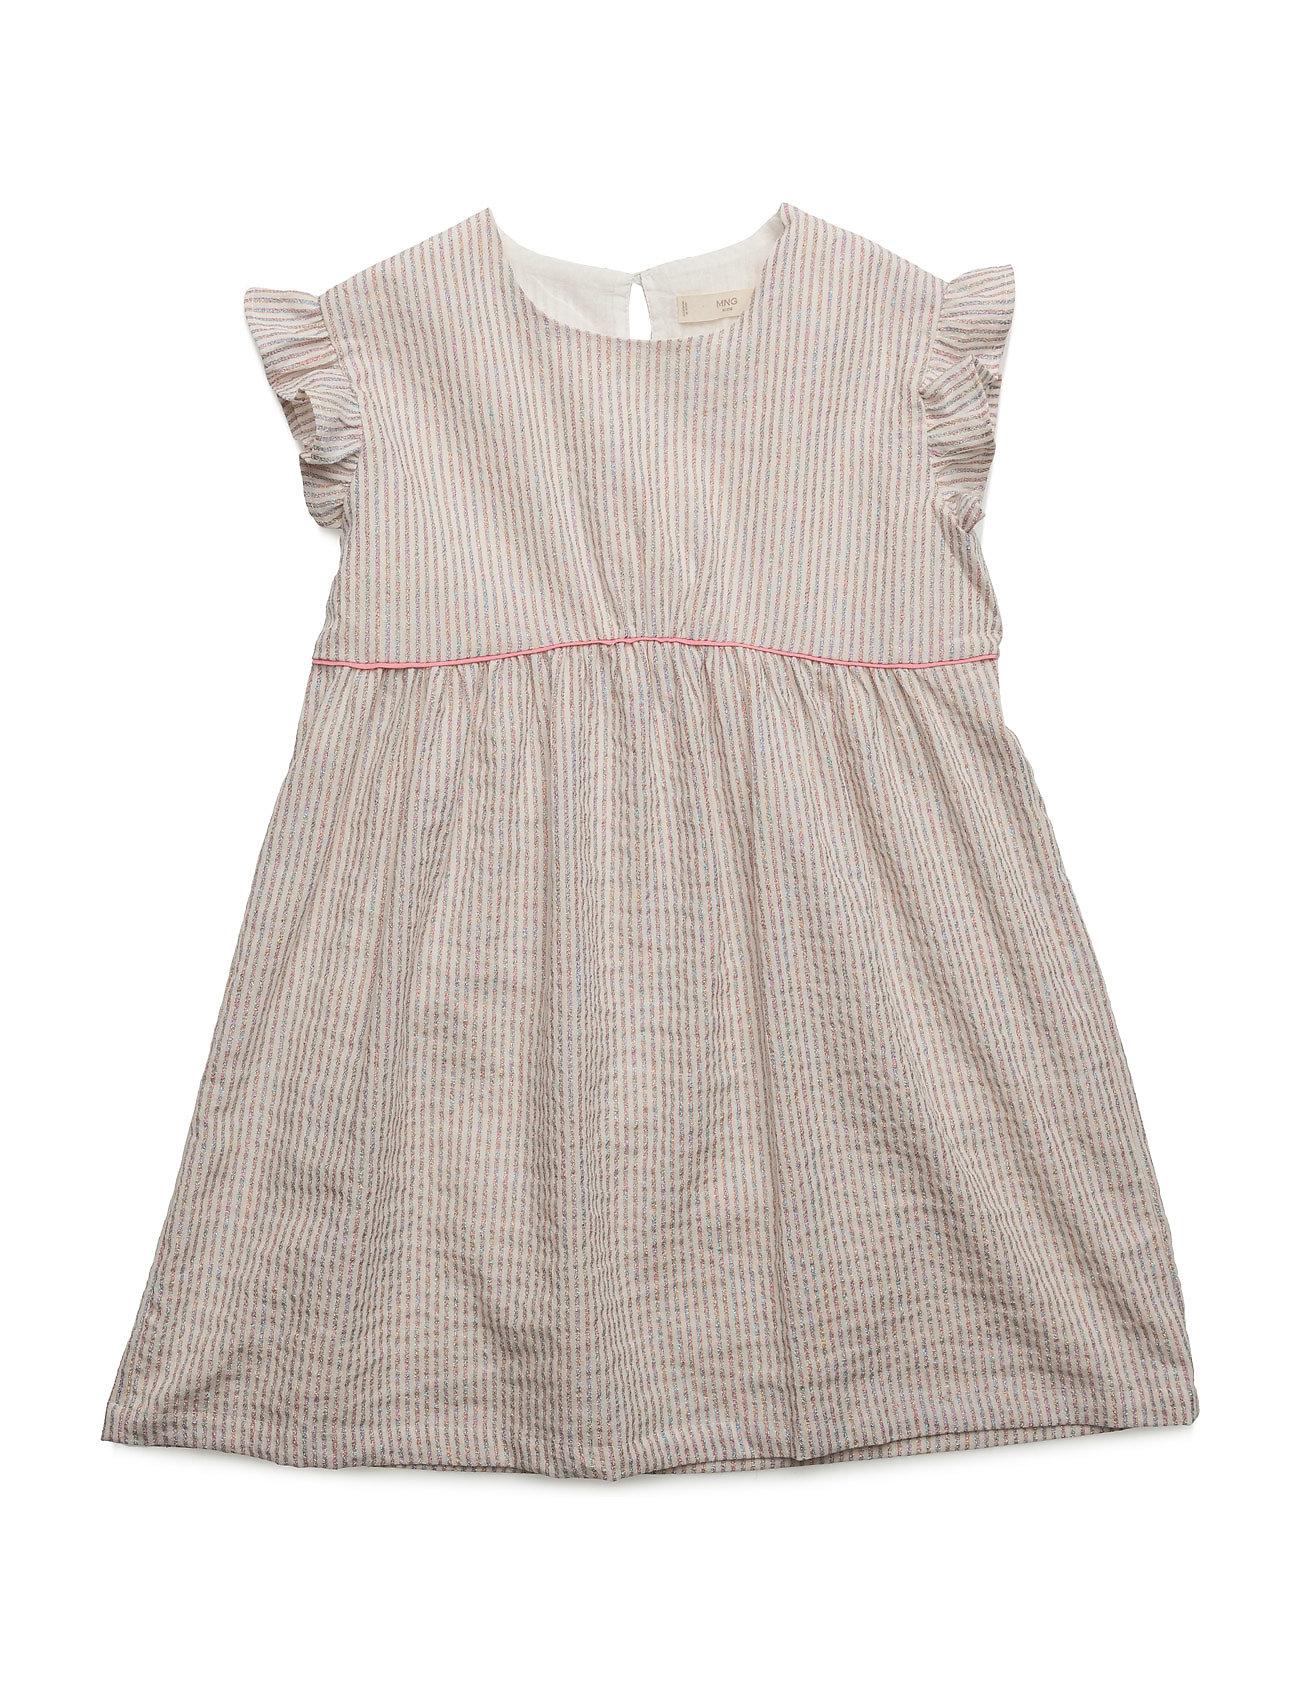 Metallic Striped Dress Mango Kids Kjoler til Børn i Lyserød